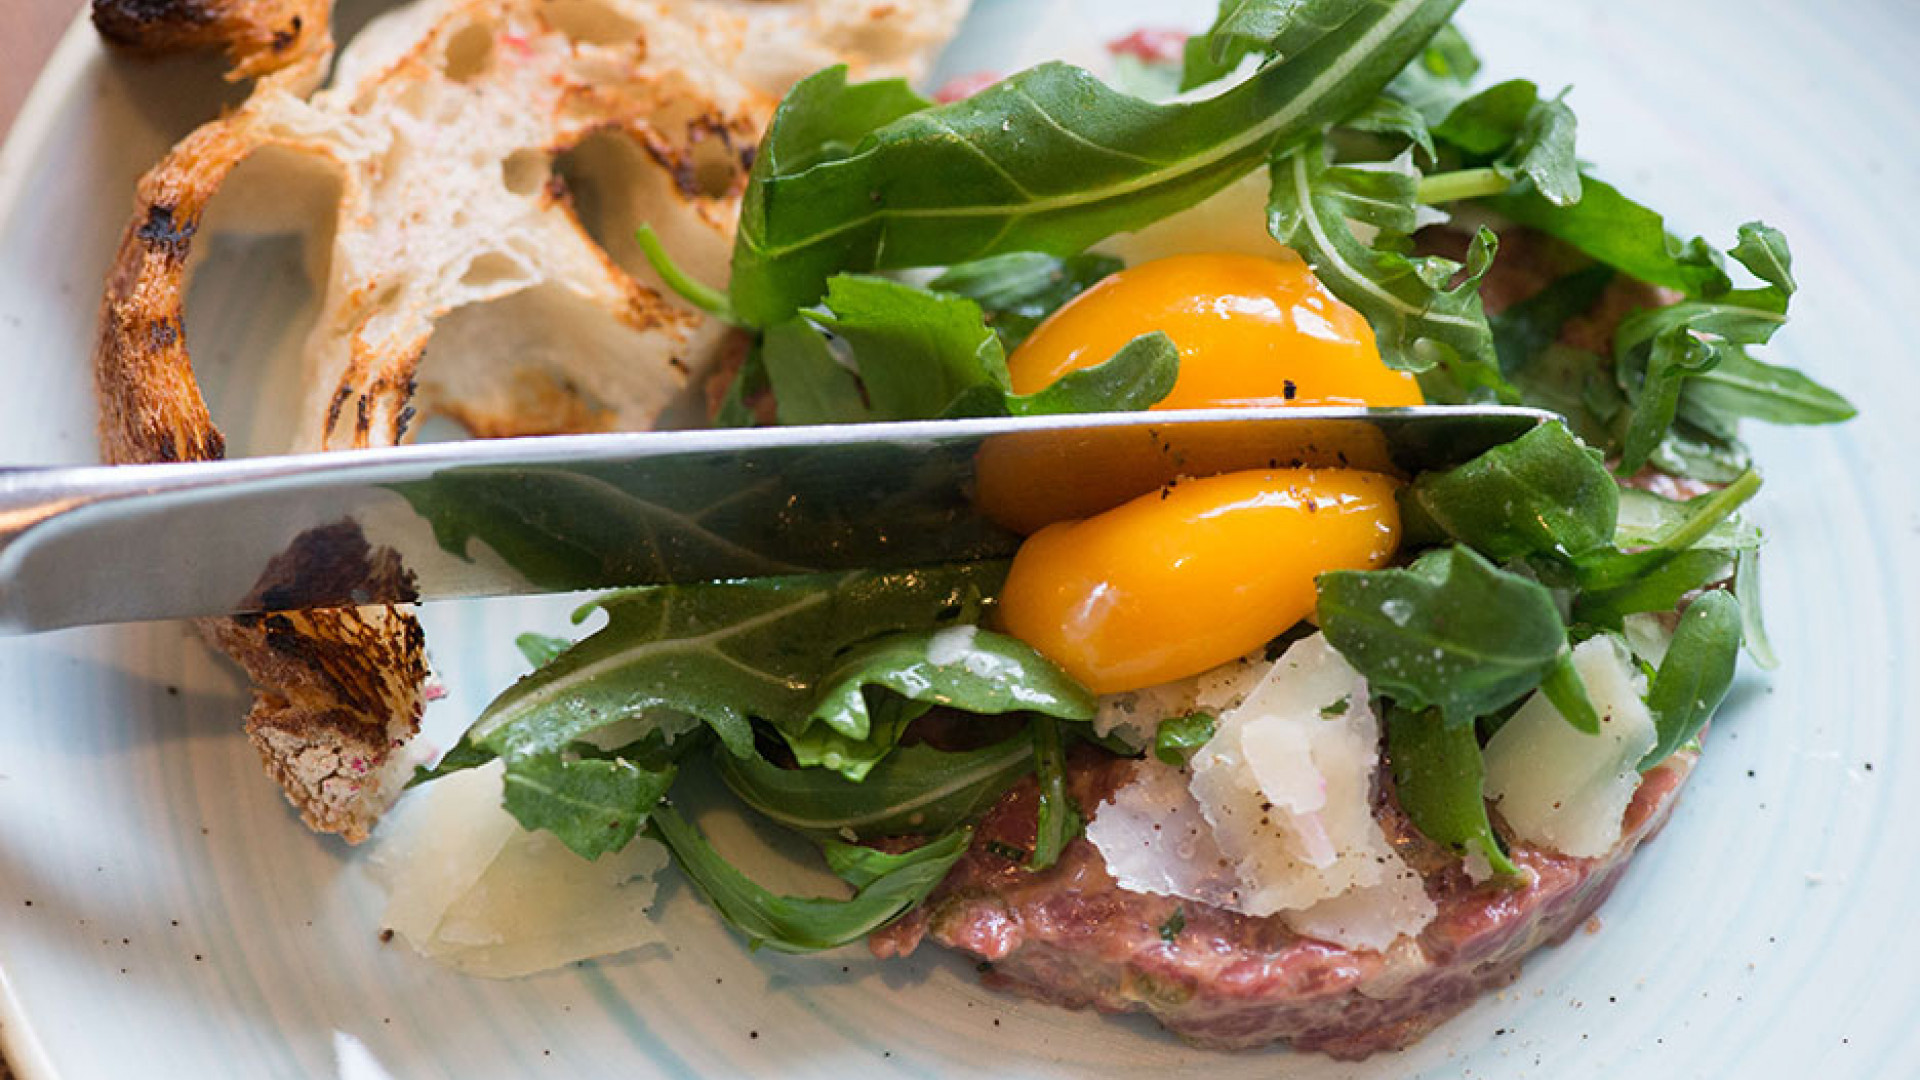 Steak tartare with egg yolk, rocket and sourdough